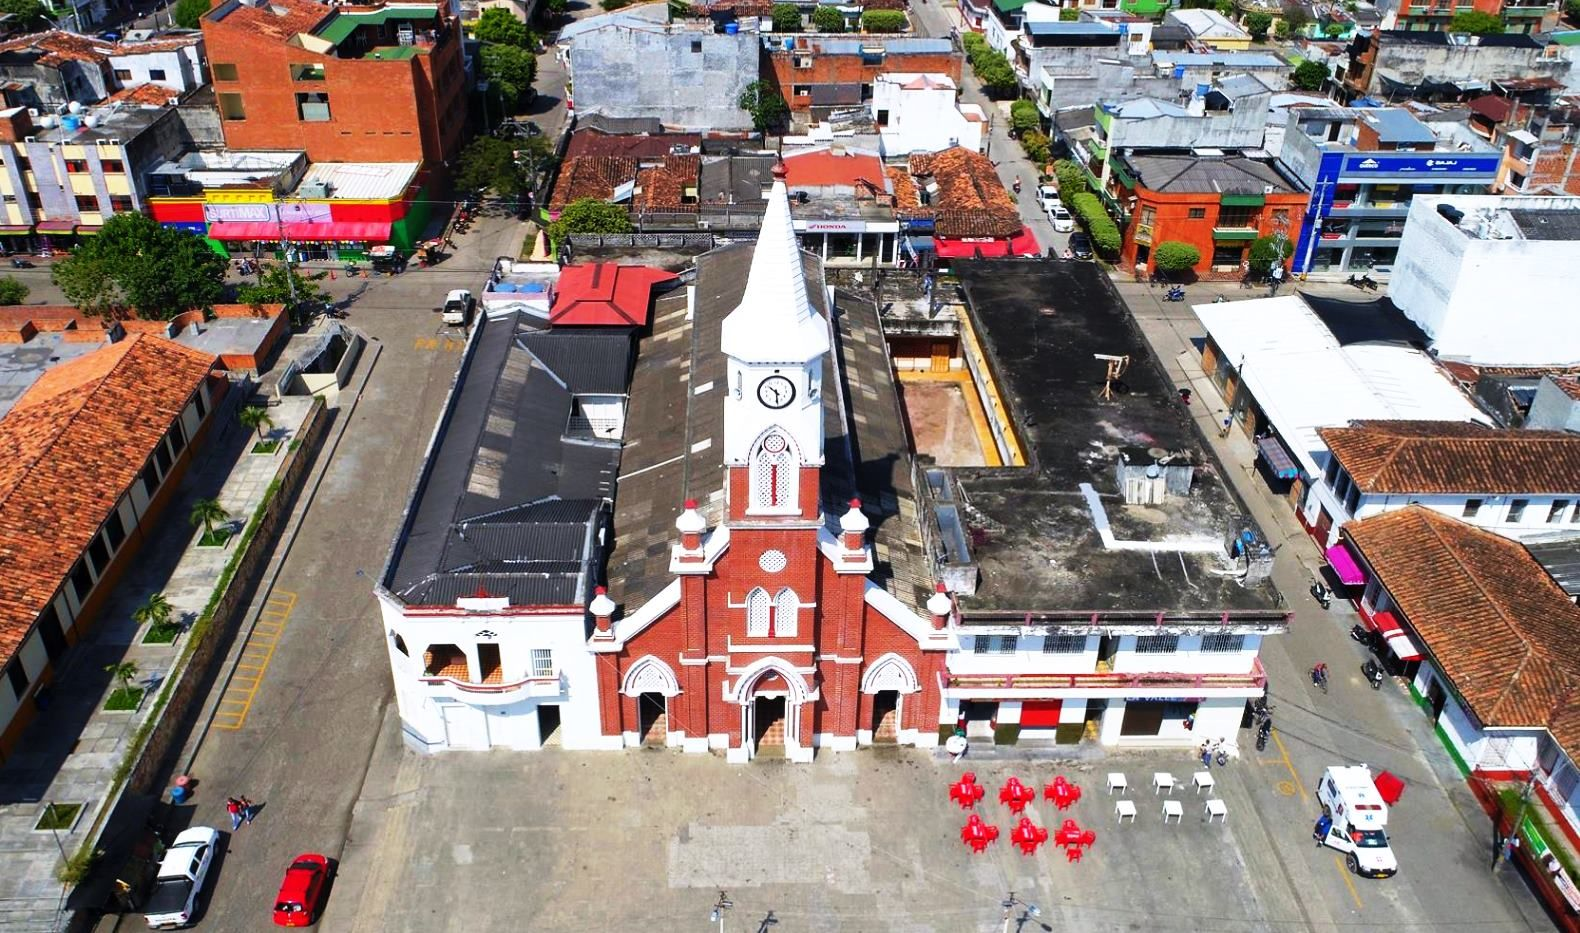 Colombia Panoramica De La Iglesia De Puerto Berrio Antioquia